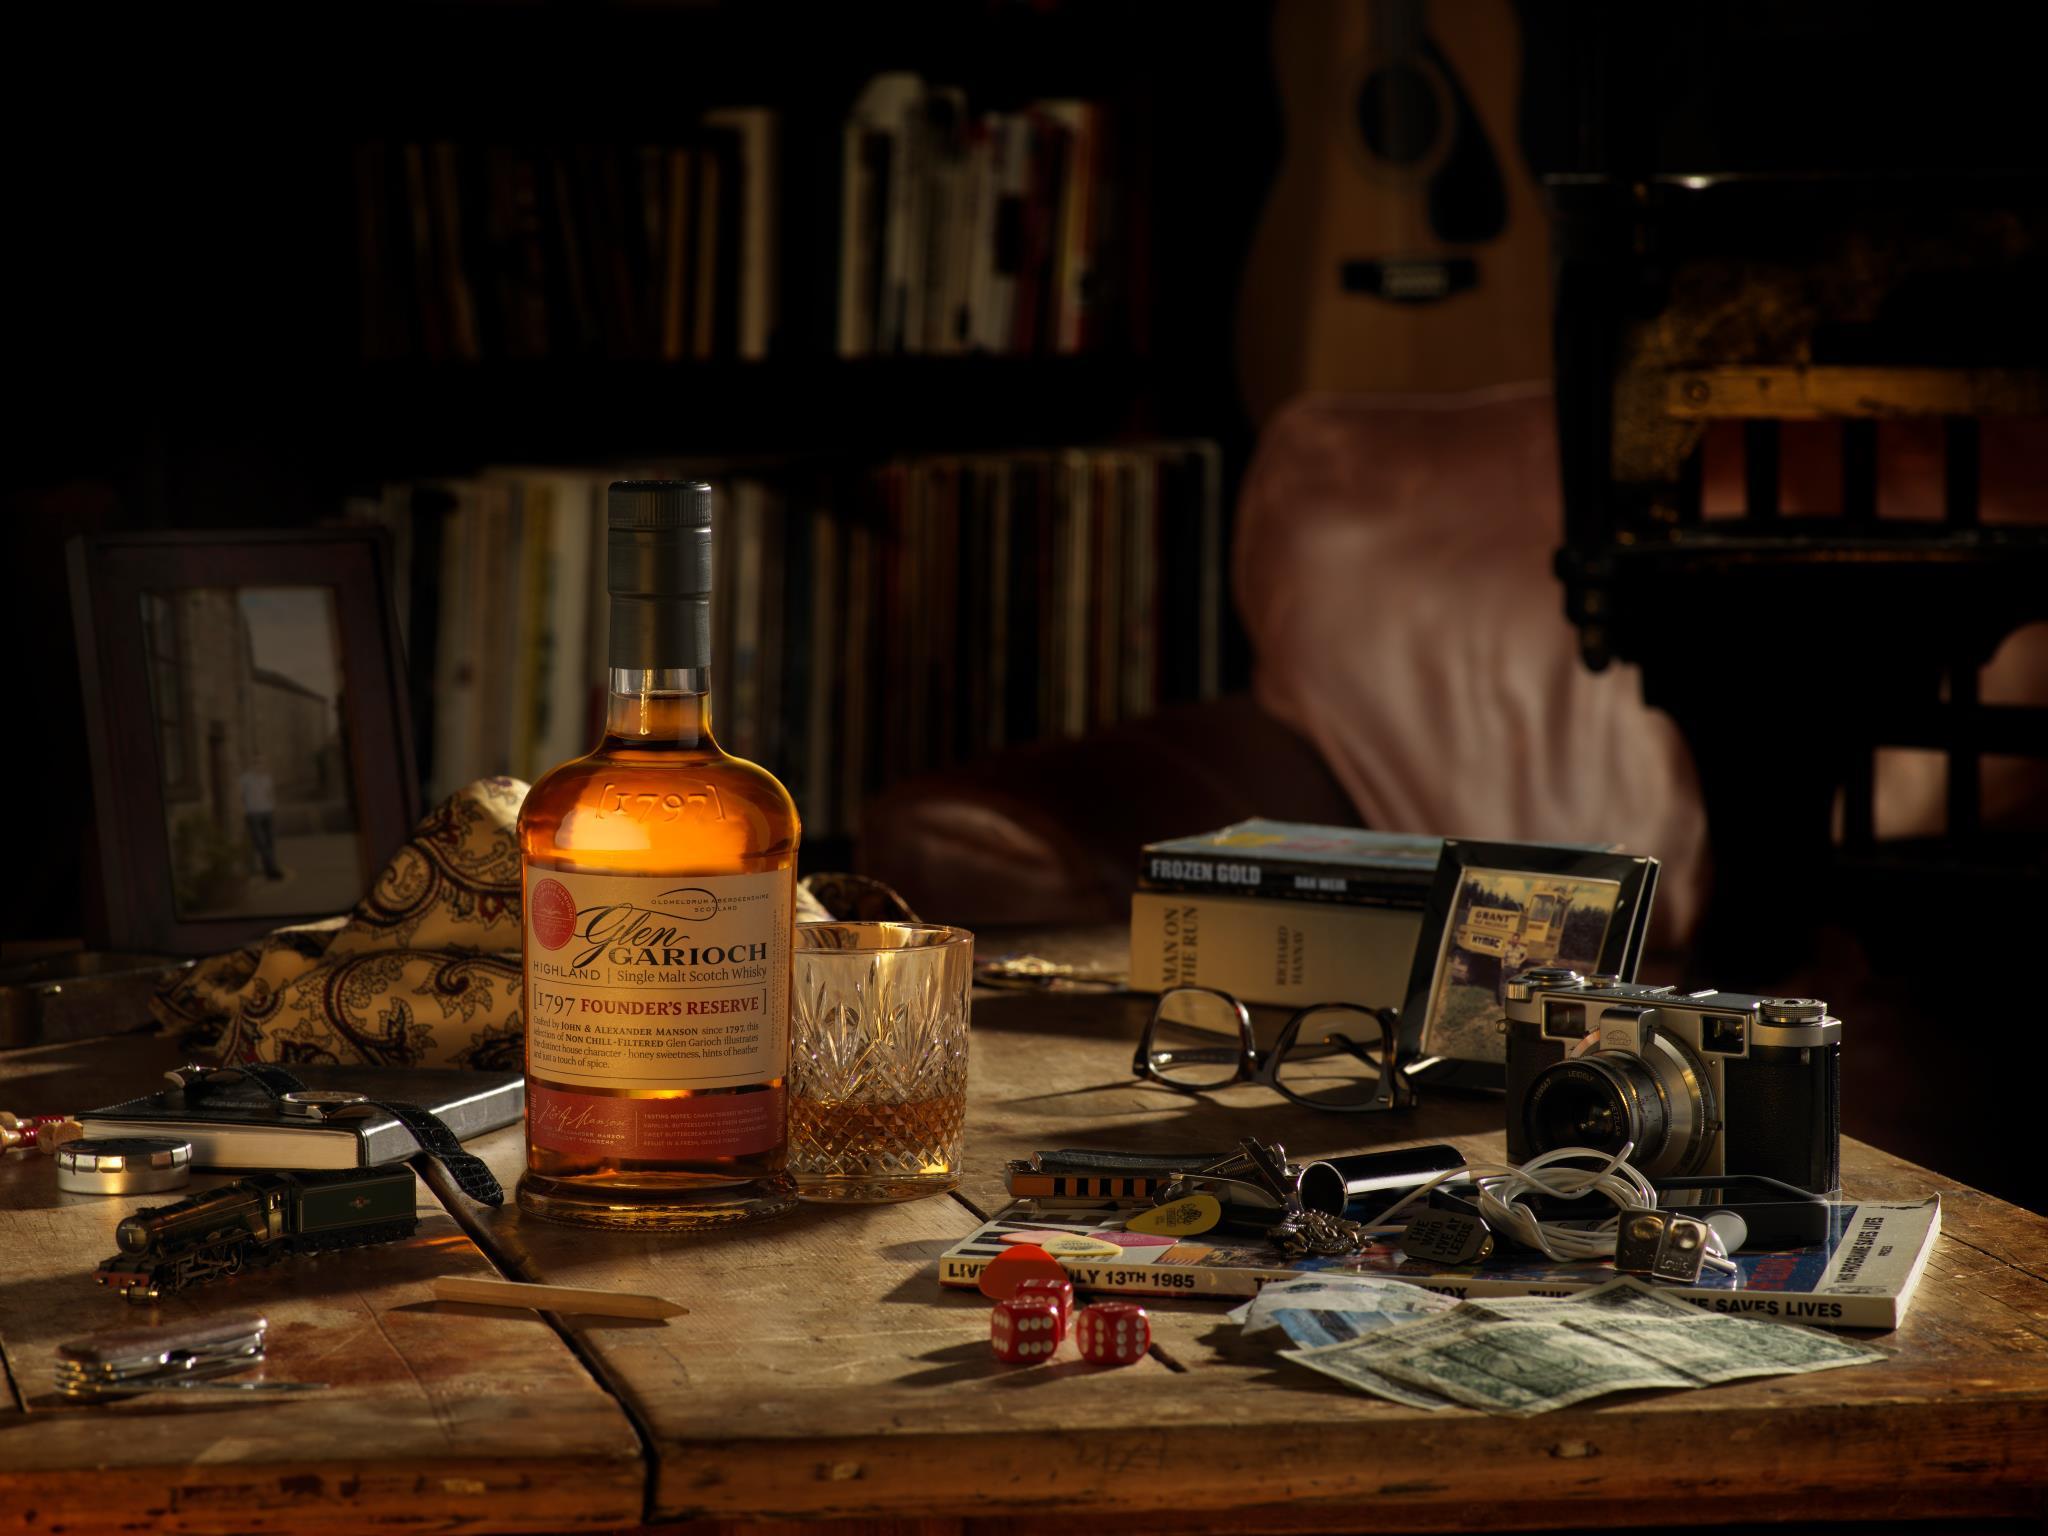 Chivas Wallpaper Hd Whiskyintelligence Com 187 2013 187 May Whisky Industry